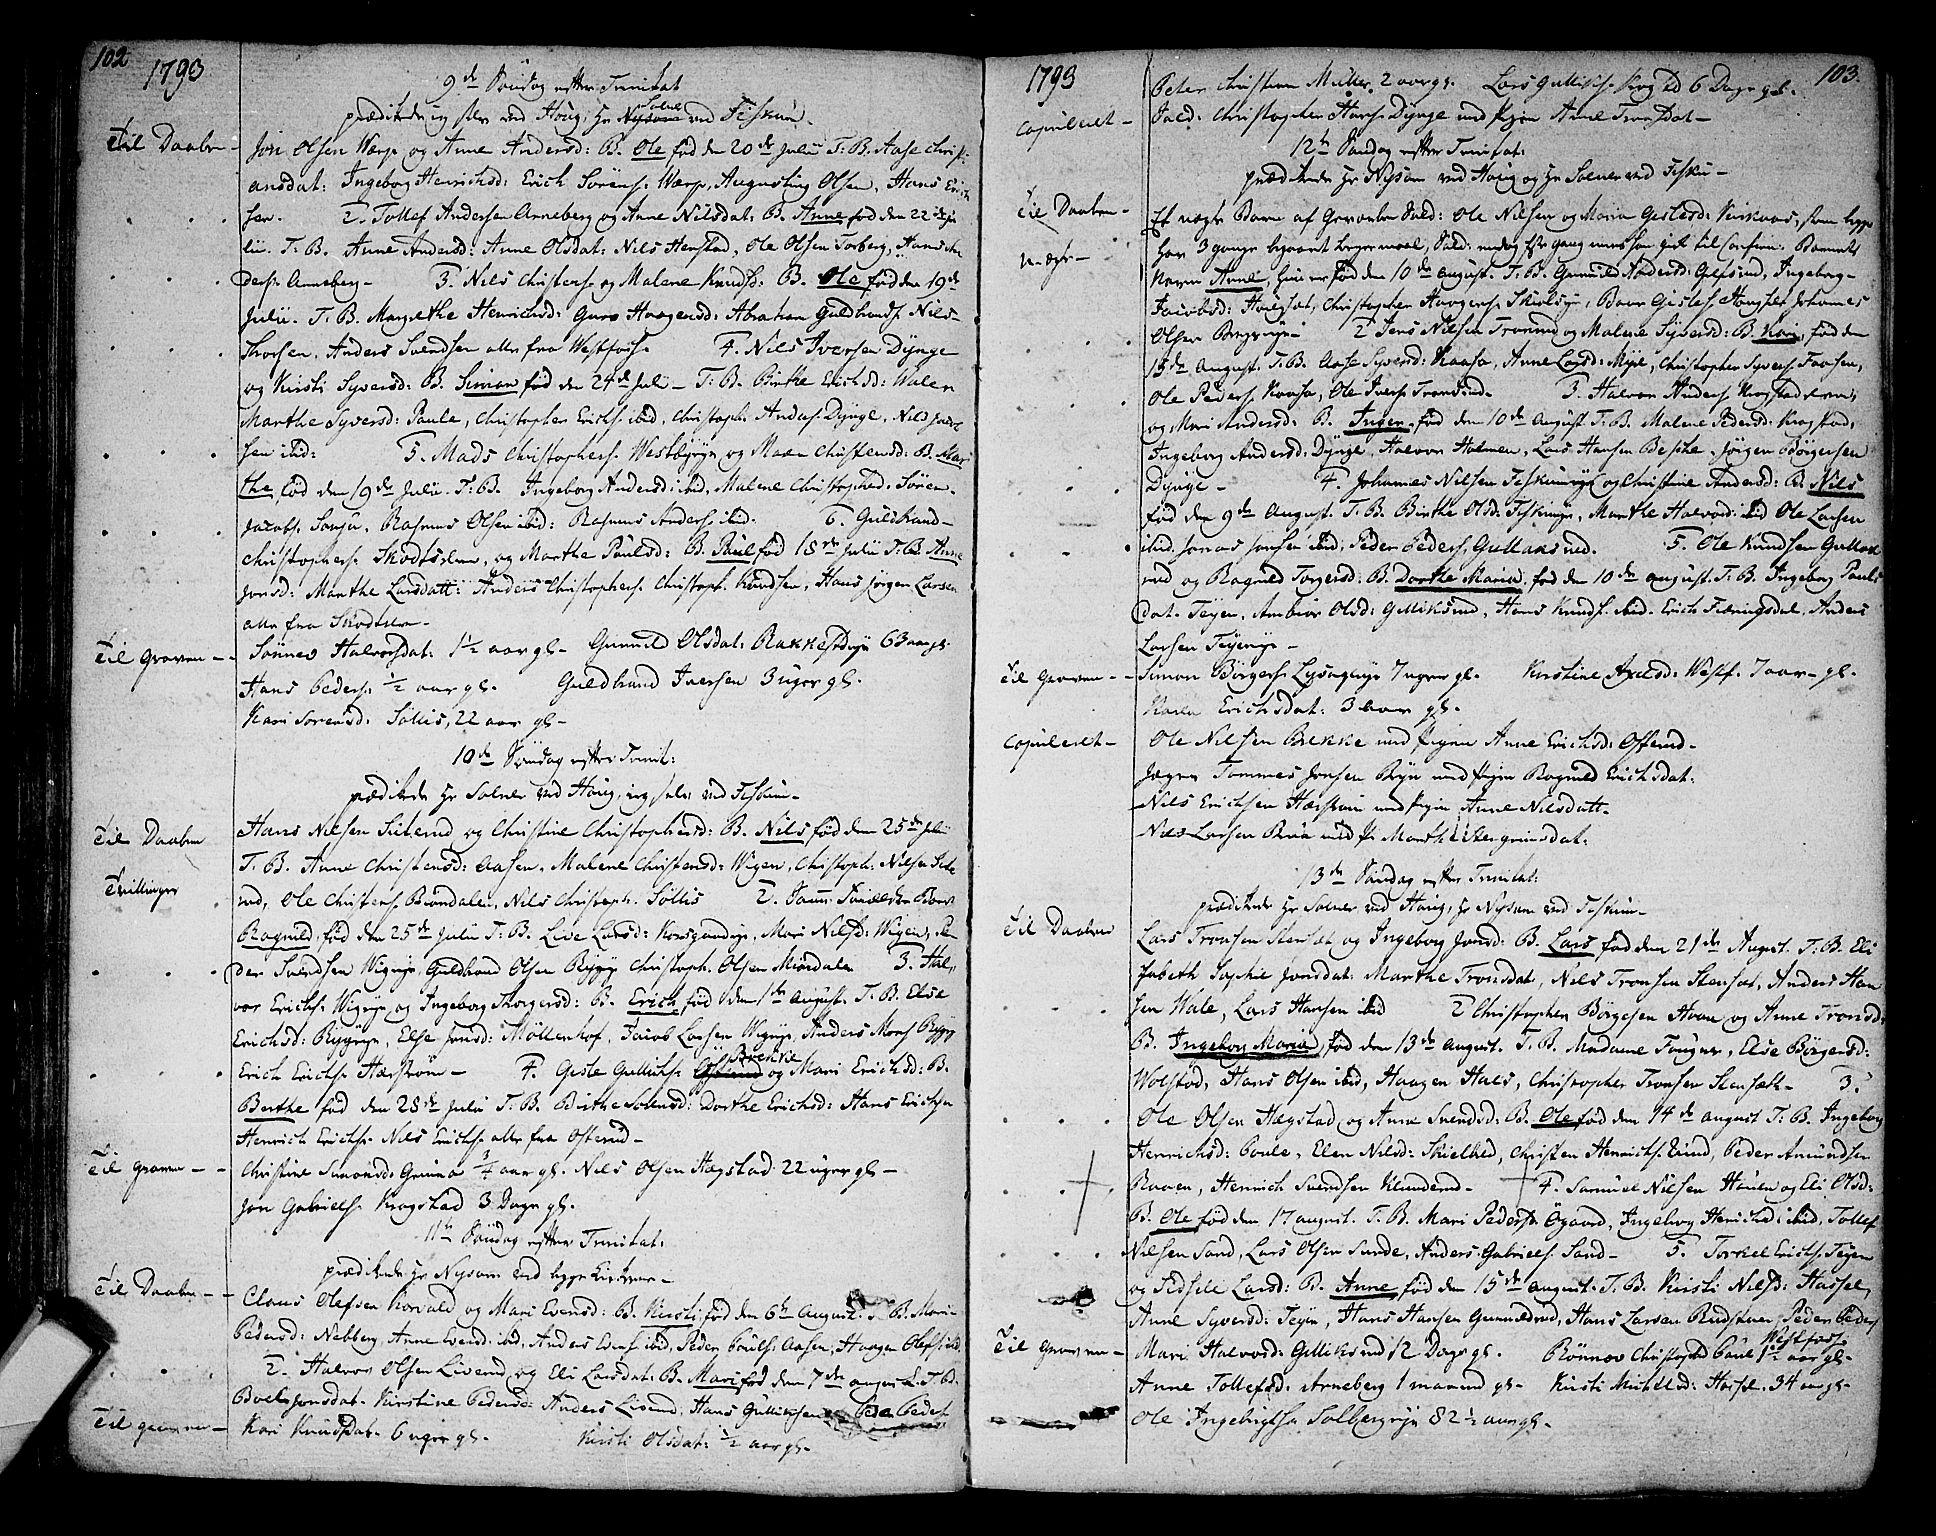 SAKO, Eiker kirkebøker, F/Fa/L0009: Ministerialbok nr. I 9, 1789-1806, s. 102-103